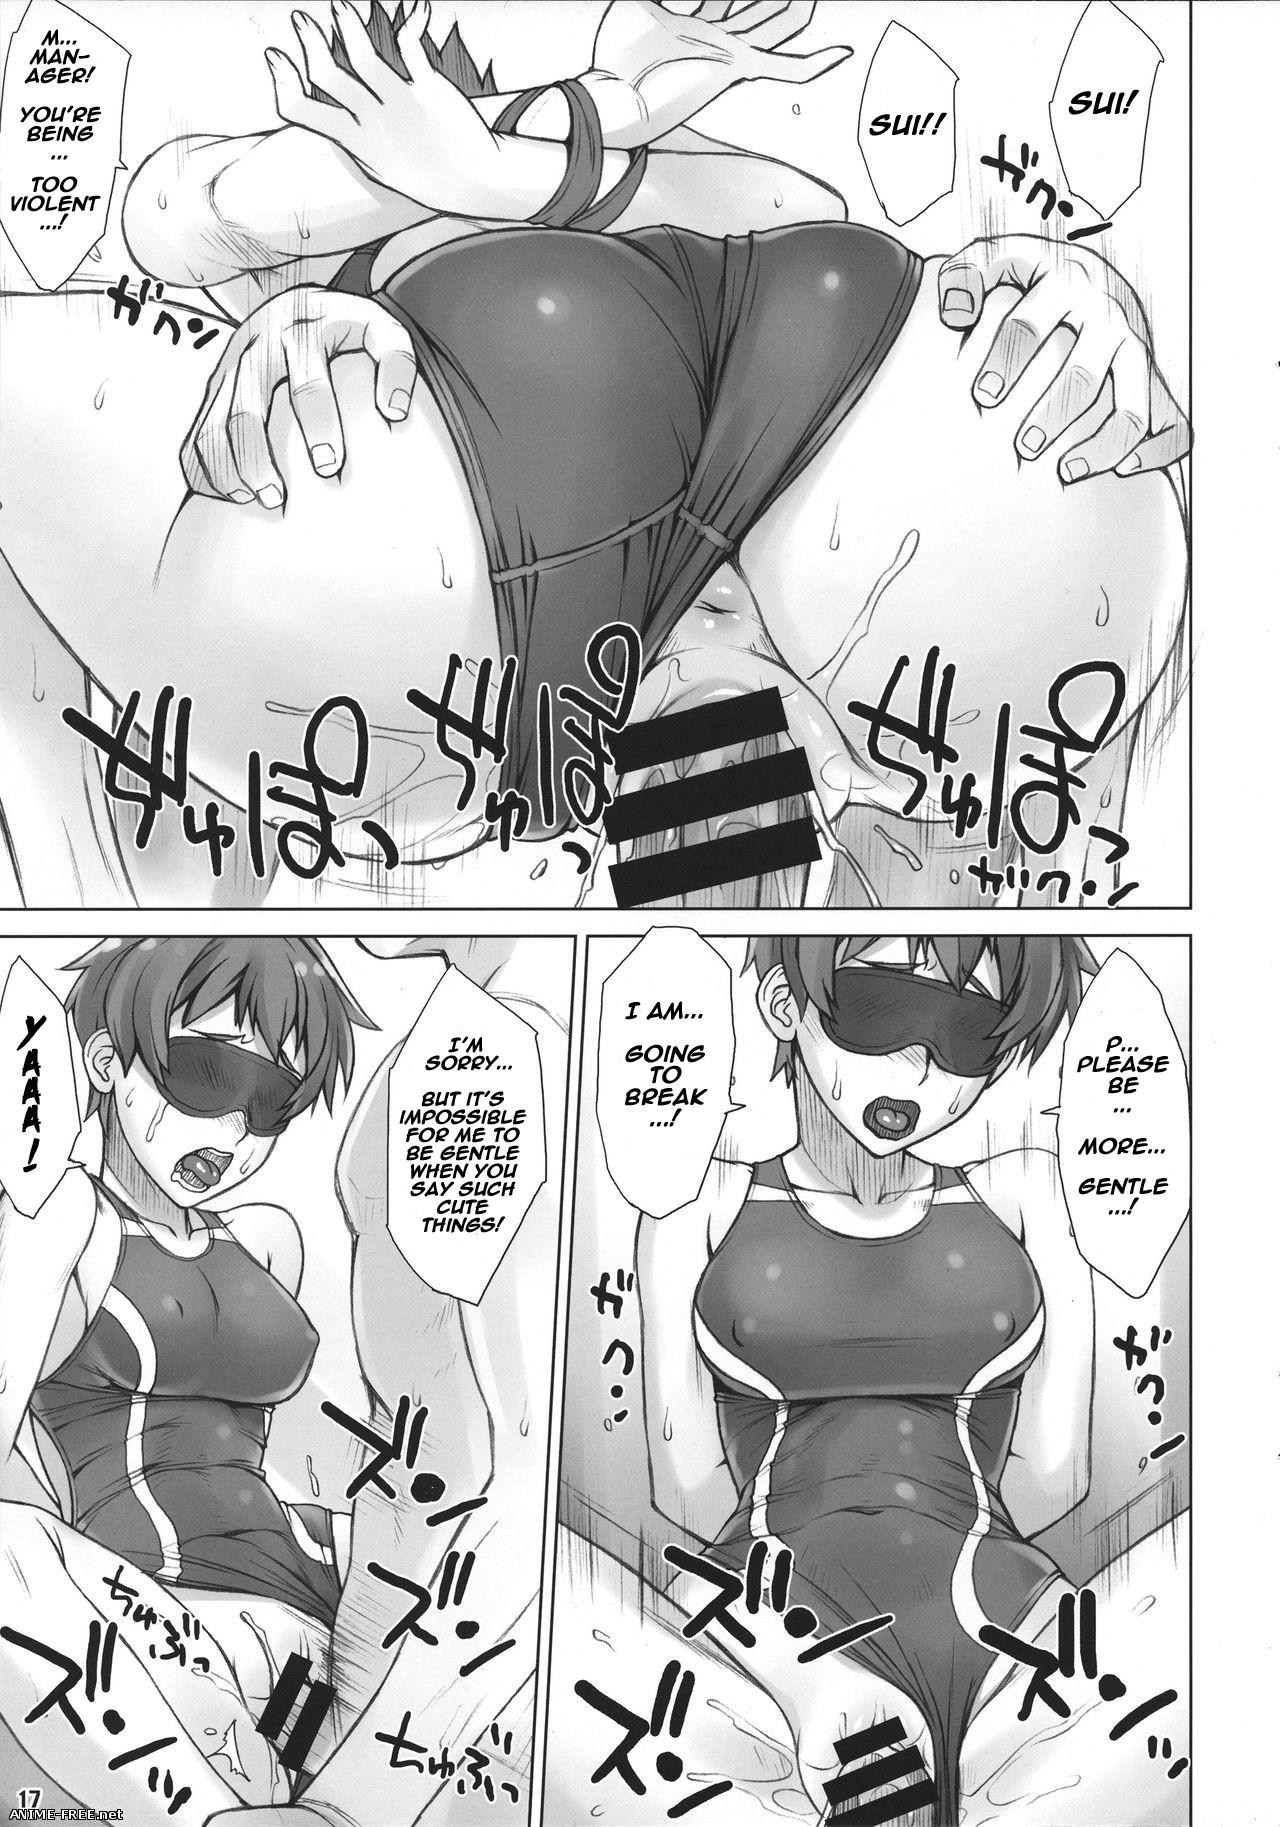 BANG-YOU / Bang You / Nagaredamaya - Сборник хентай манги [Ptcen] [JAP,ENG,RUS] Manga Hentai